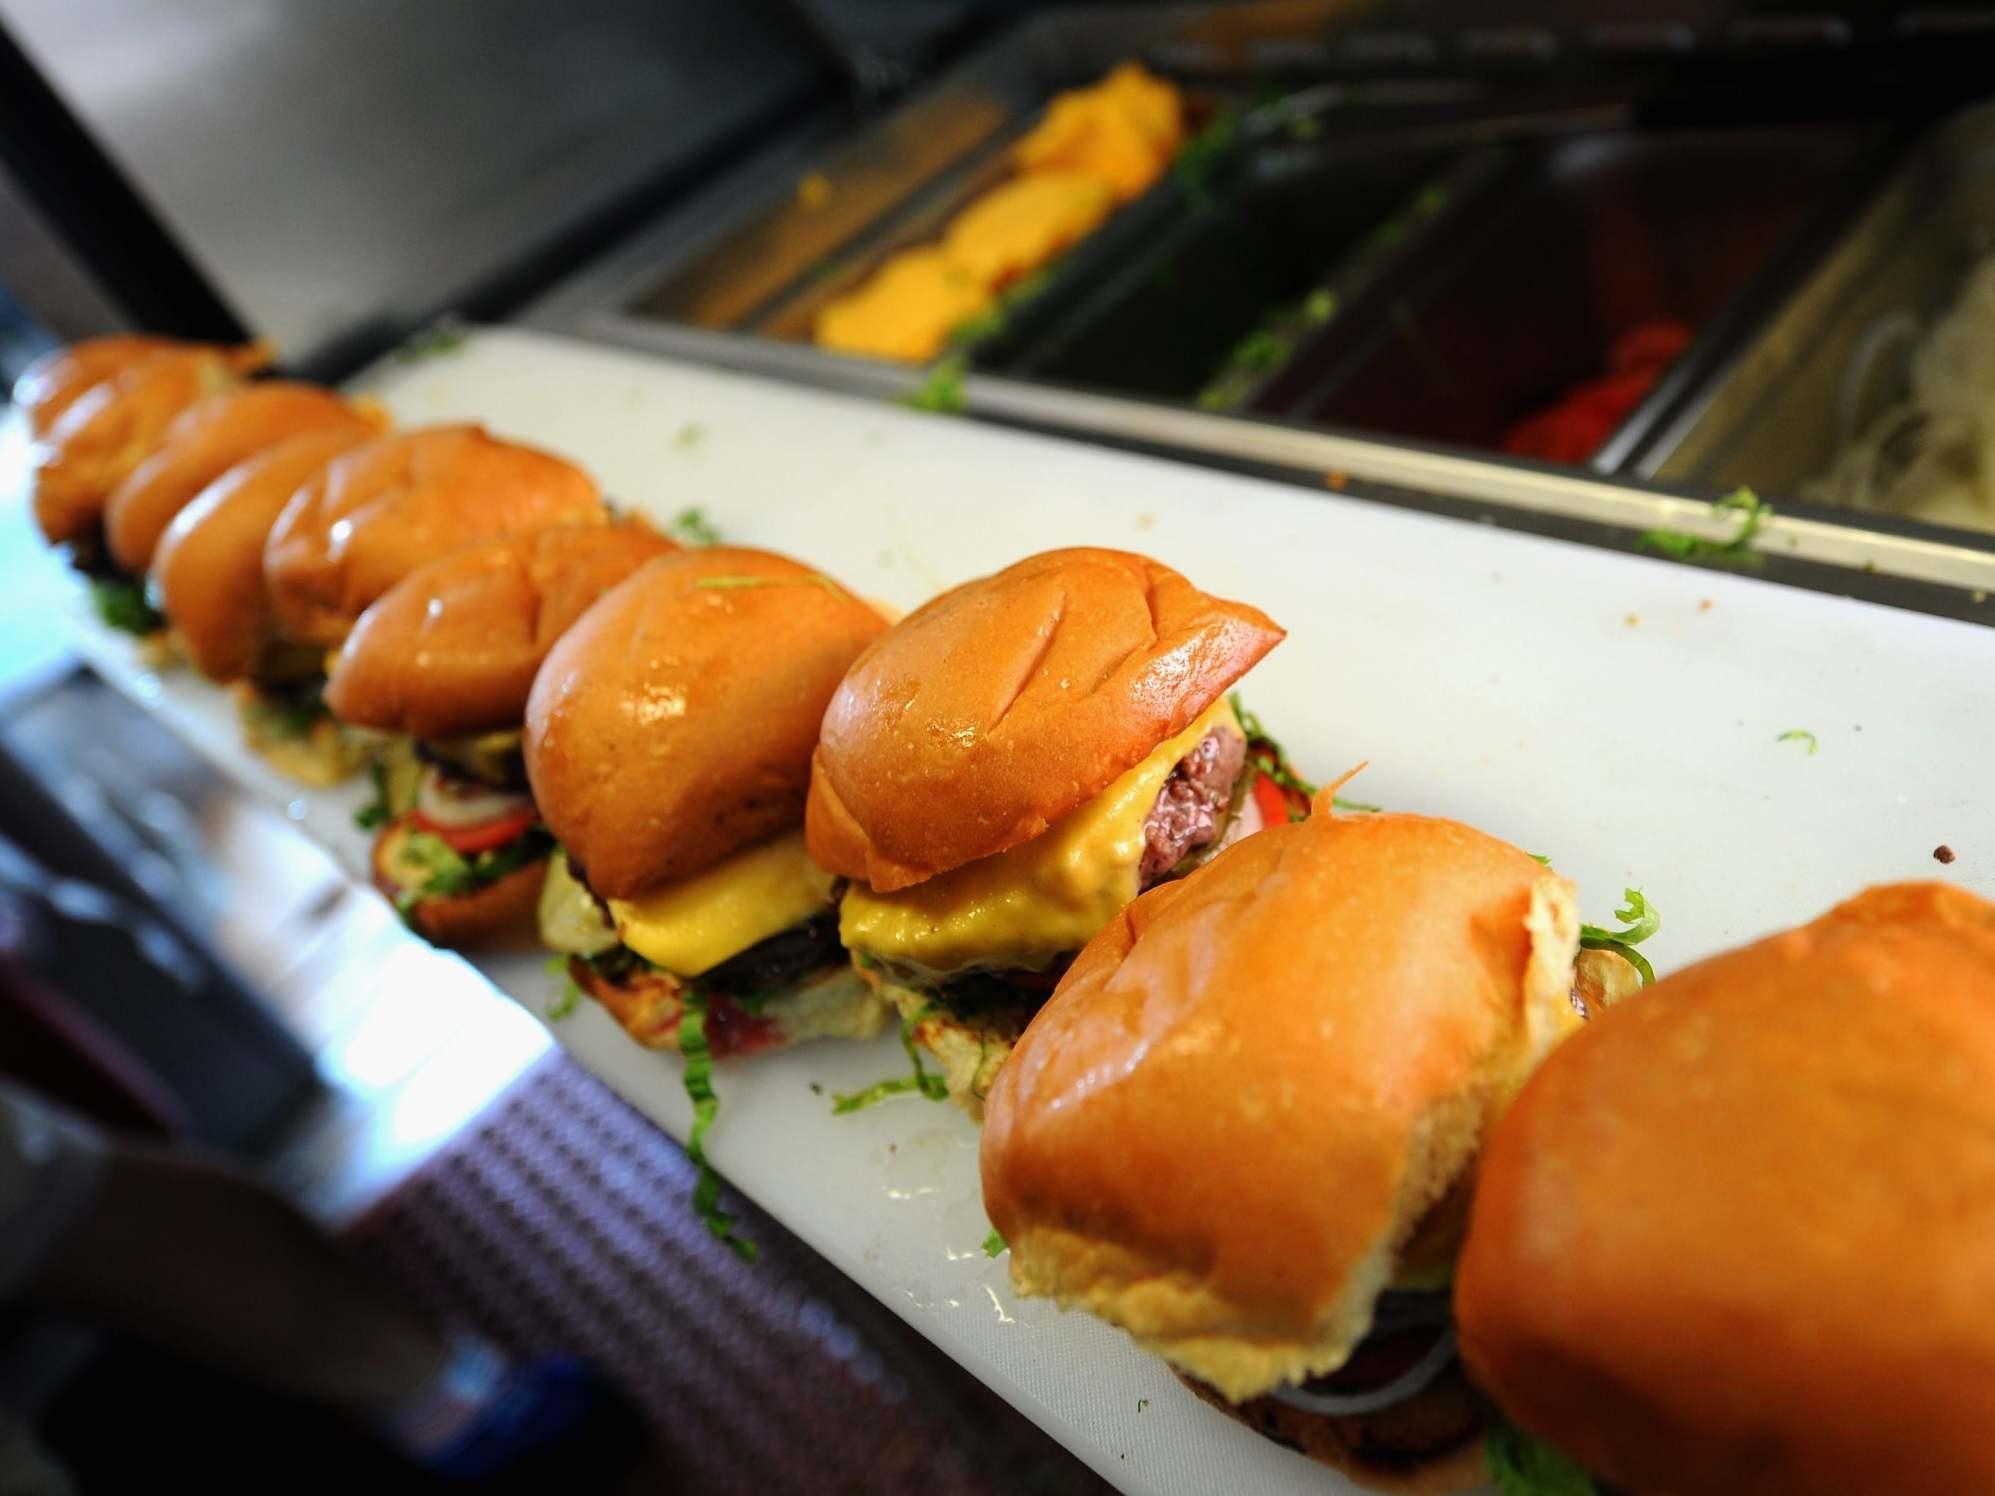 Wahlburgers restaurant review: A sad, slow burger for a big name 1